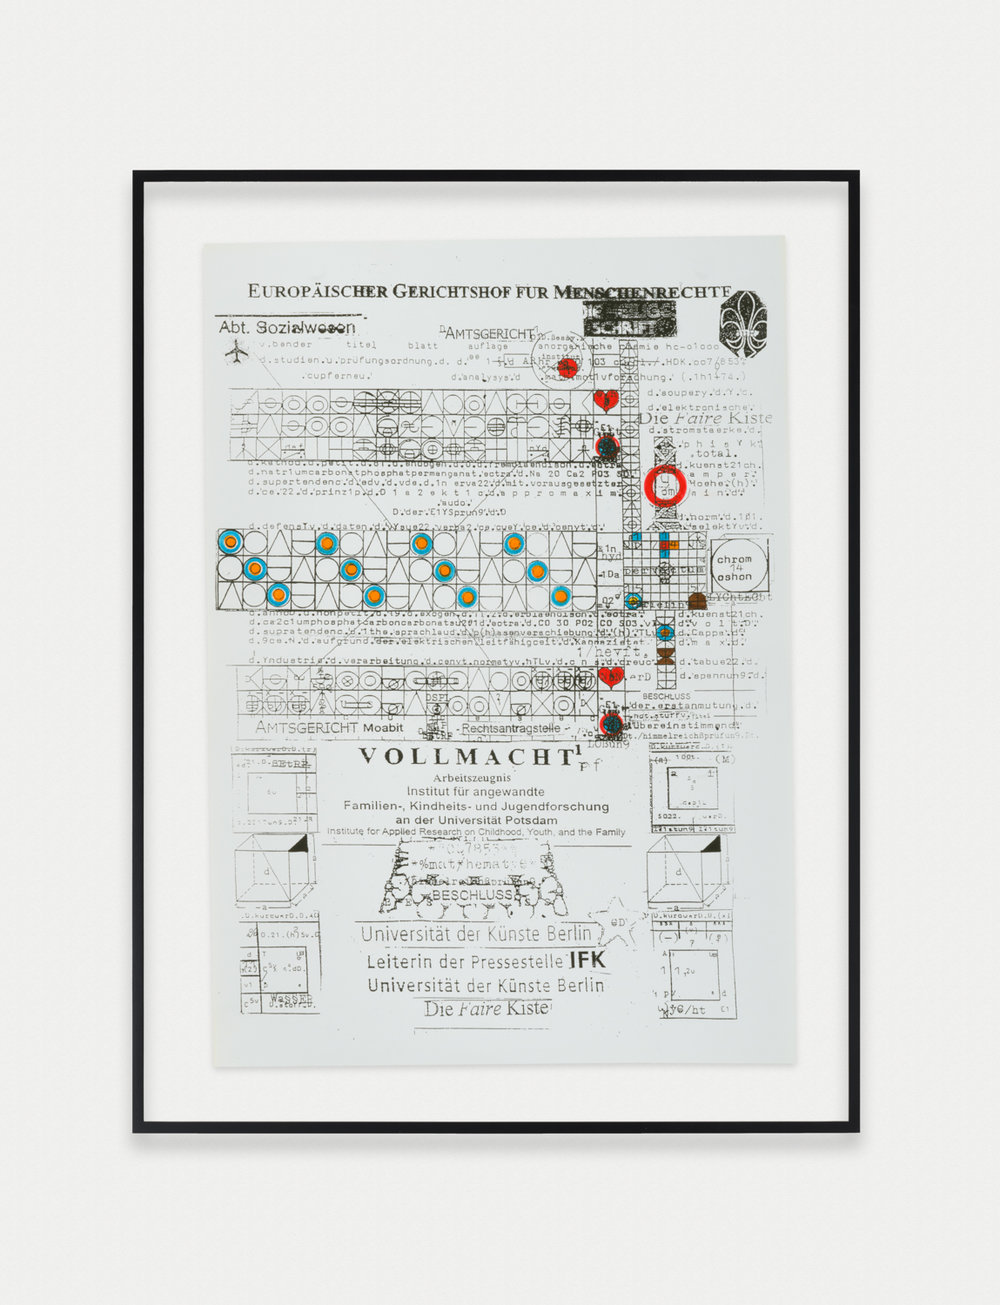 Adelhyd van Bender Untitled 1999-2014 Mixed media on photocopy 16.5 x 11.75 in (41.91h x 29.85w cm) AVB020